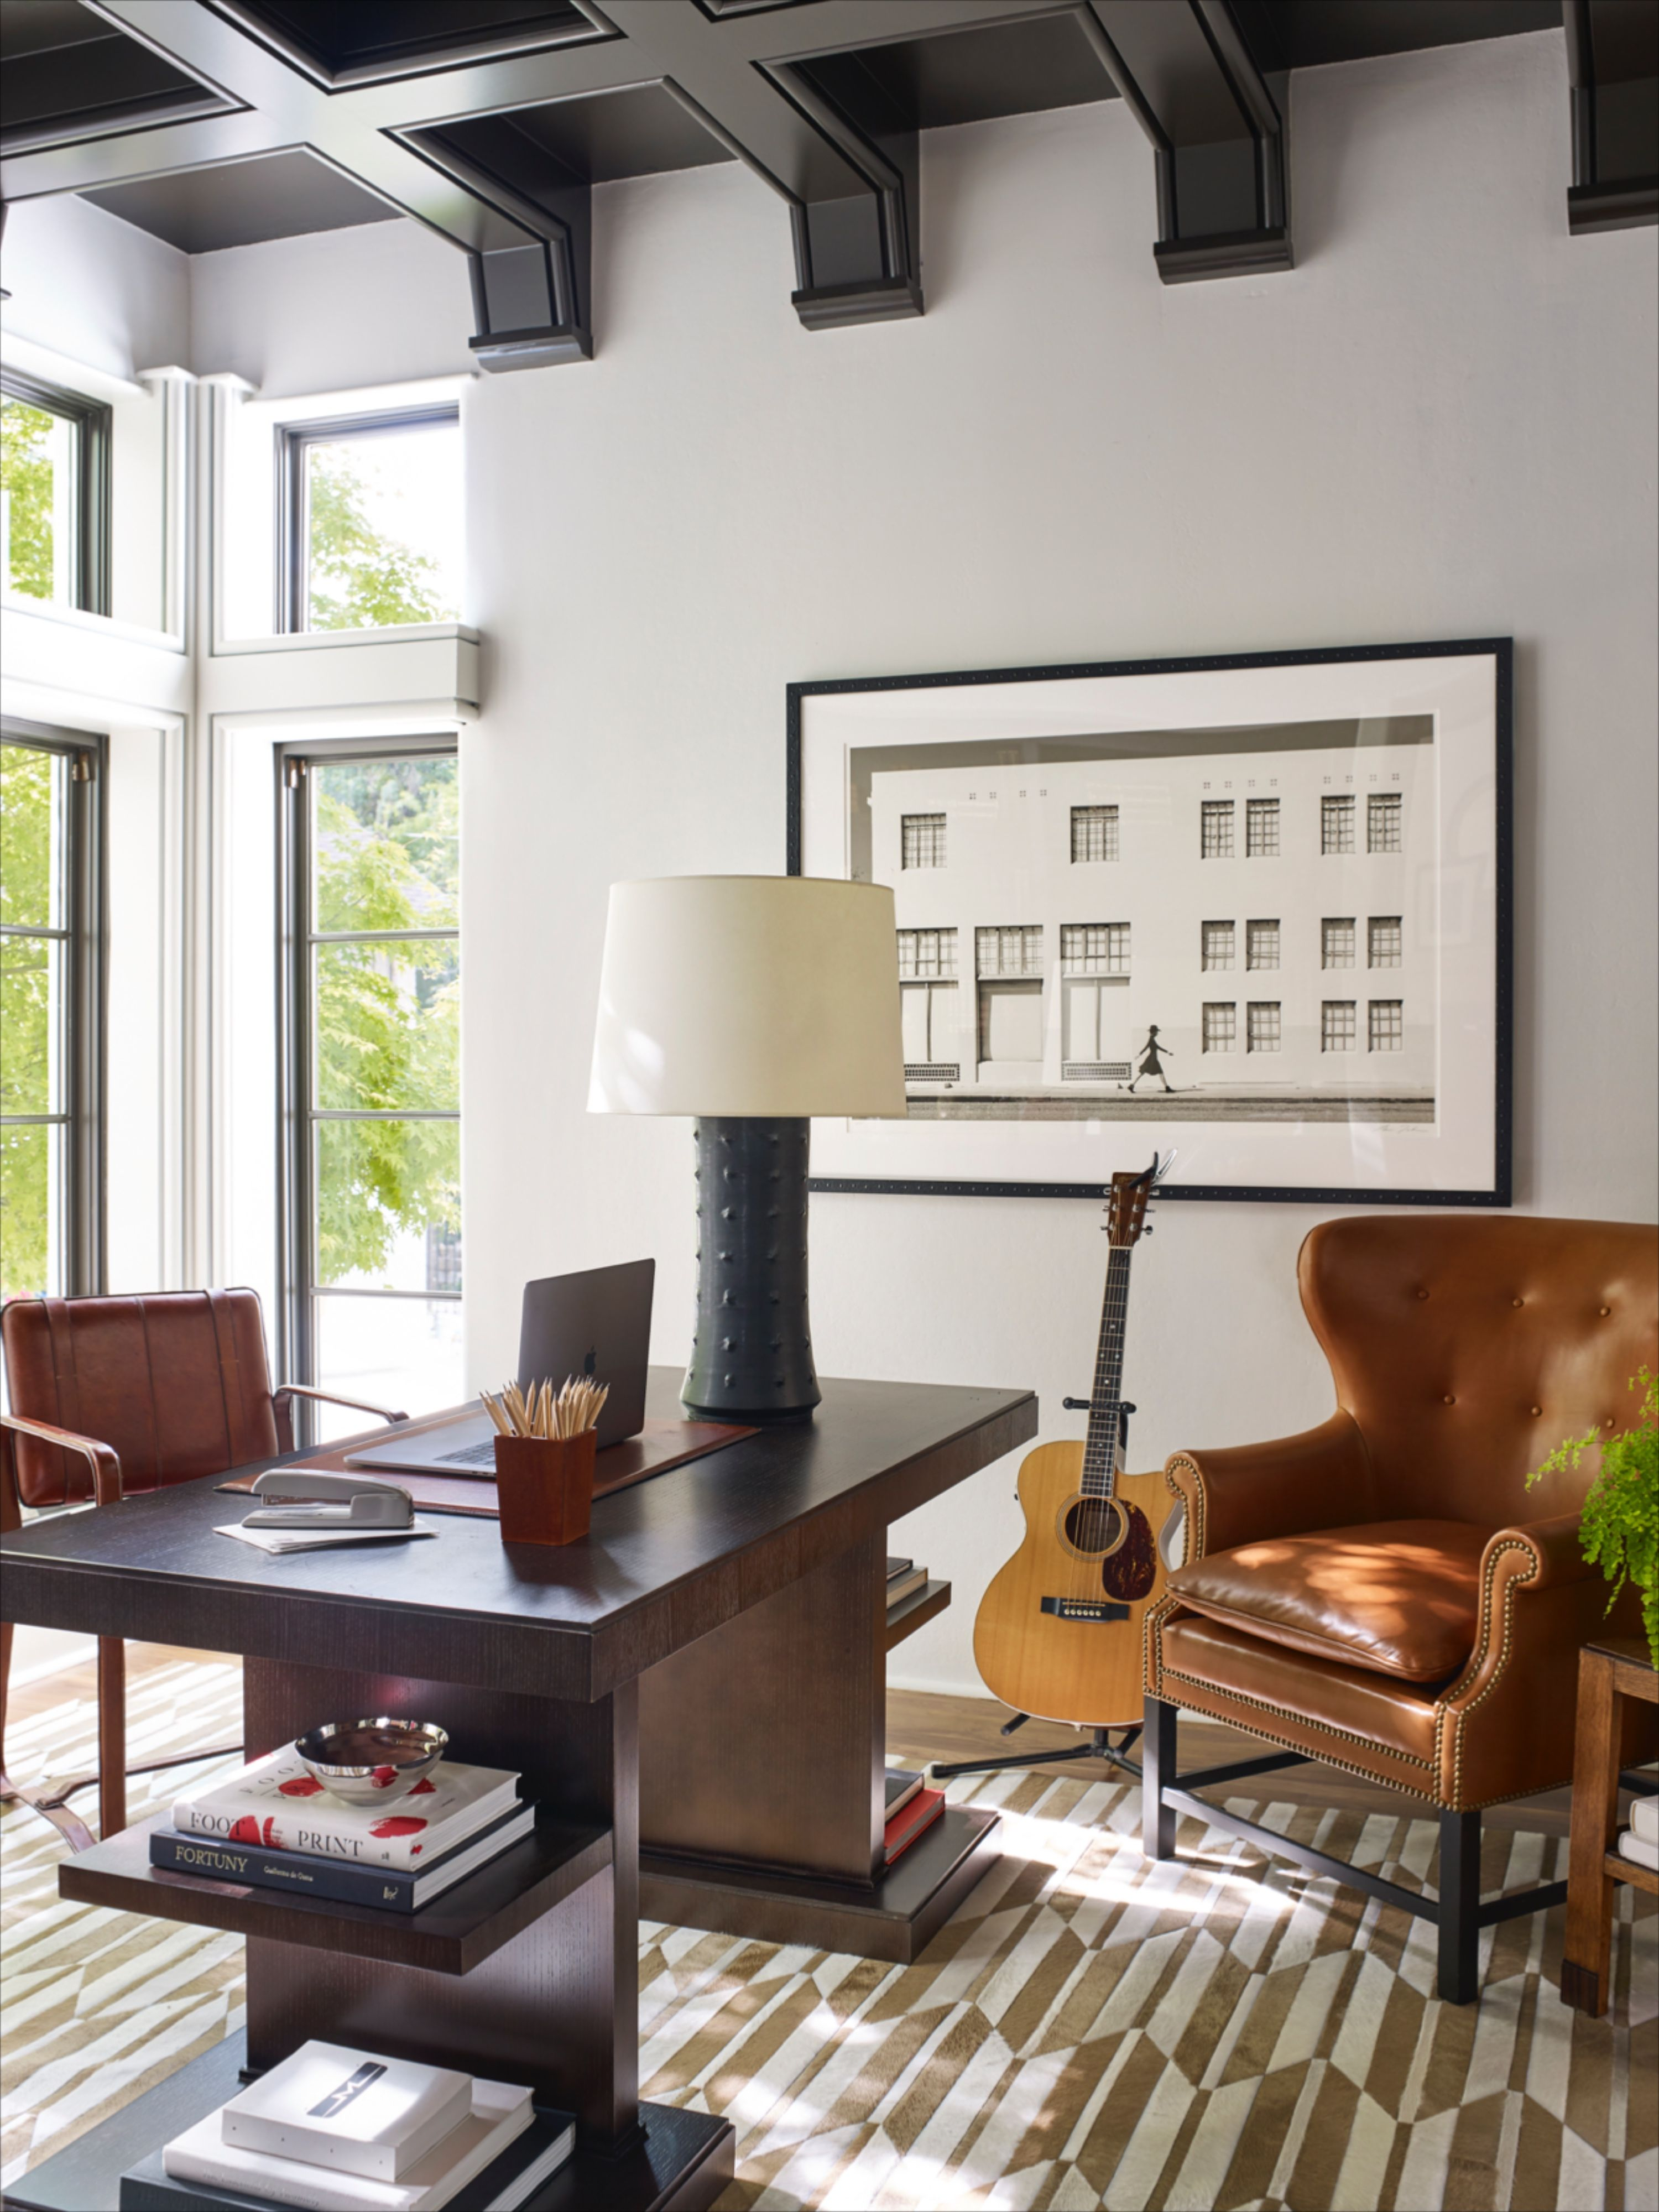 #glamofficespace #rusticofficespace #elegantoffice #officedesign #leatherchairsoffice #homeofficeinspo #homeofficeinspiration #luxuryhomeoffice #luxuryhomedesign